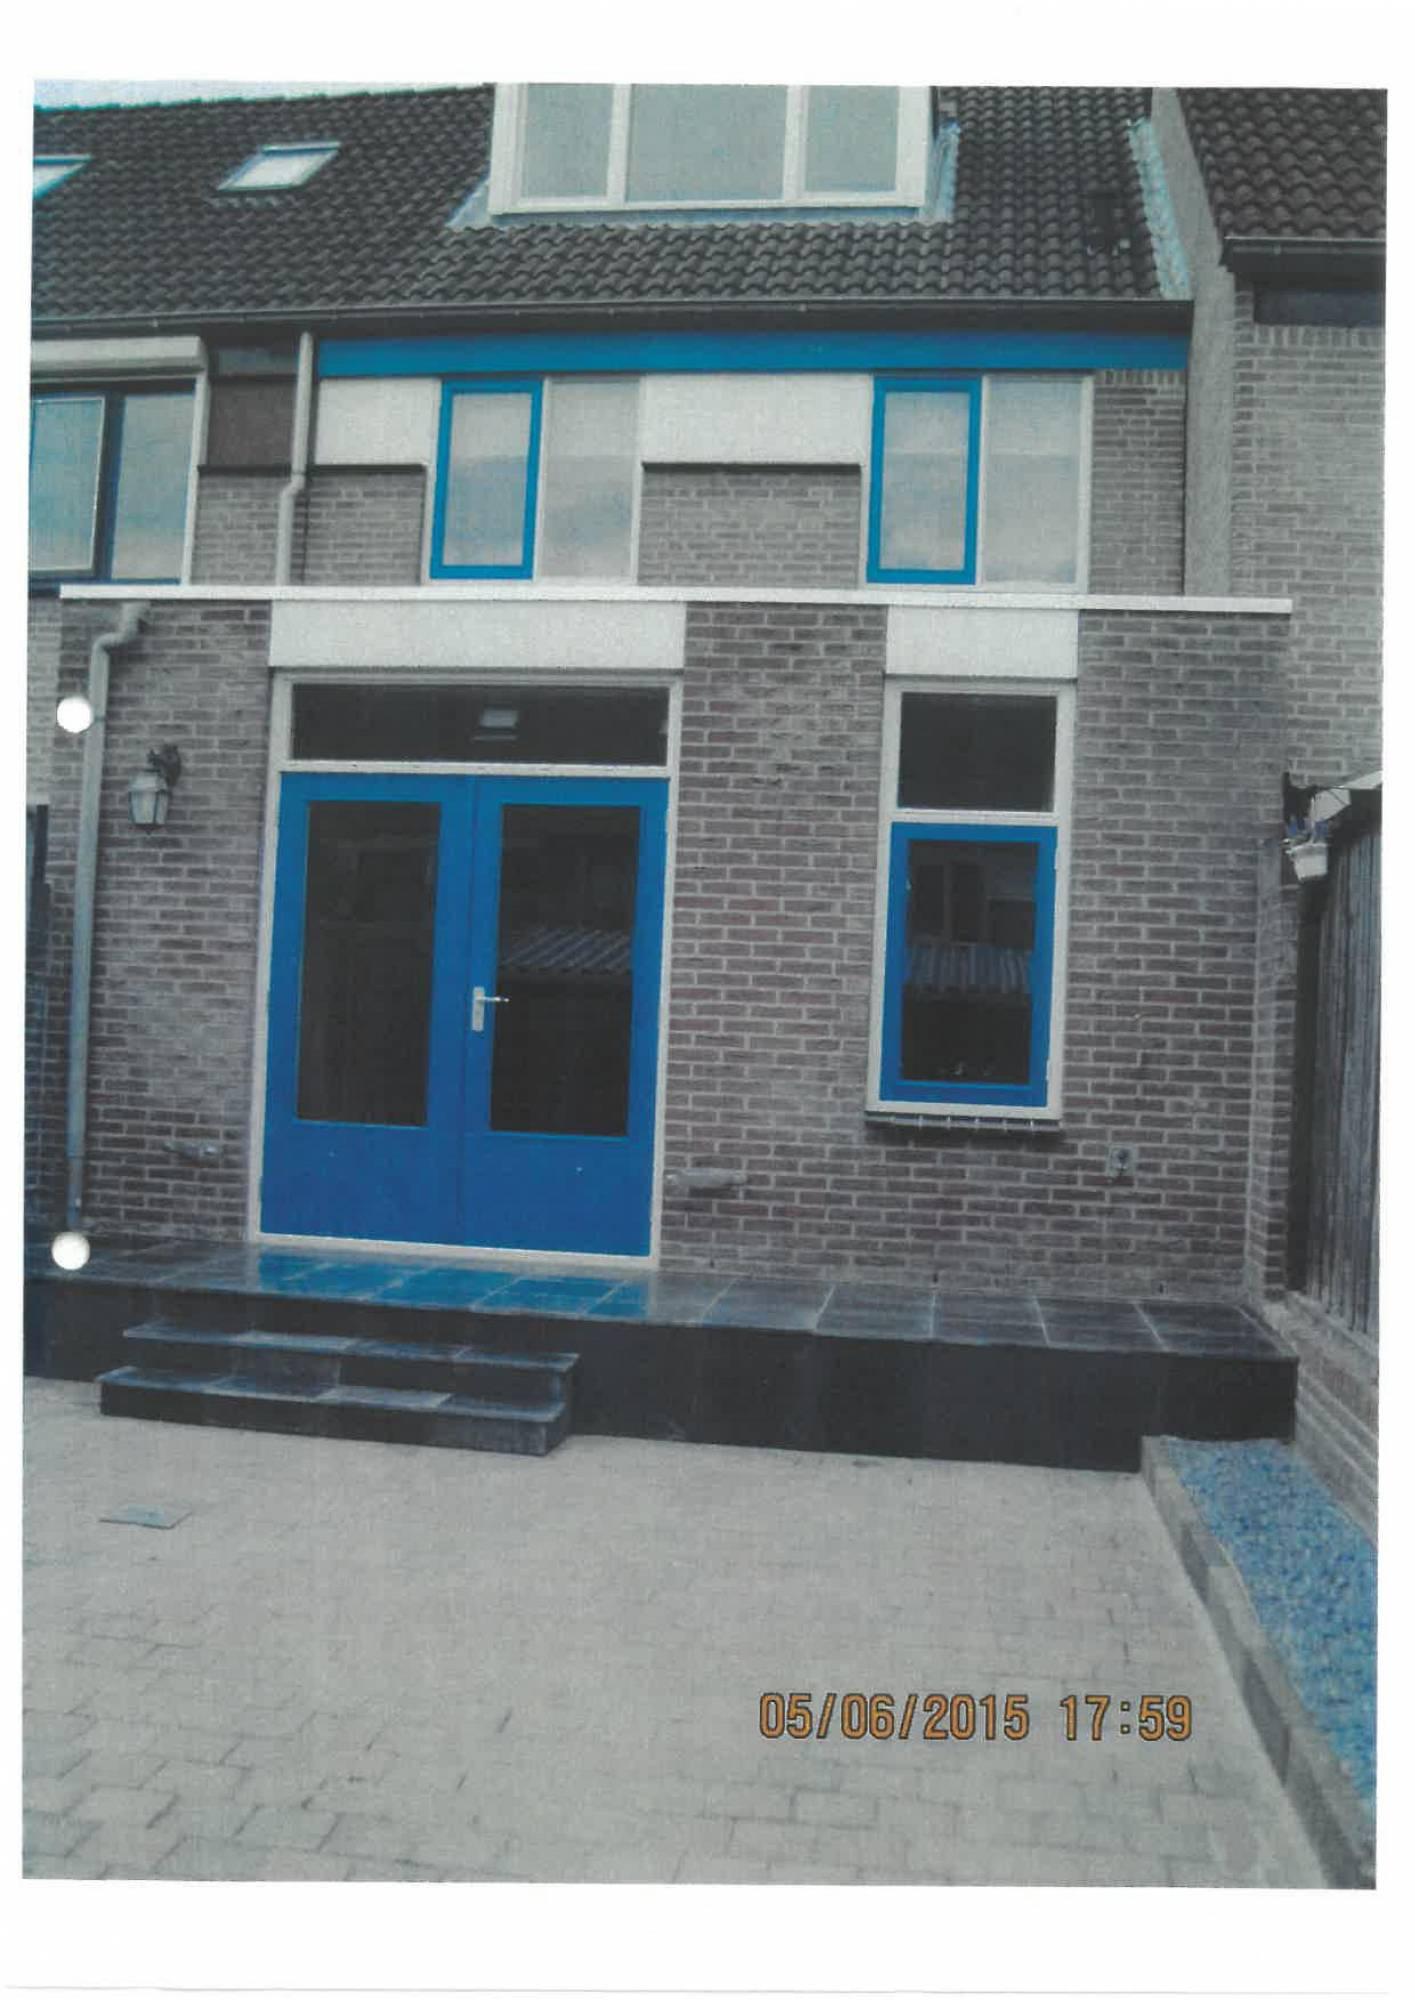 https://public.parariusoffice.nl/170/photos/huge/51882556.1544103373-596.jpg